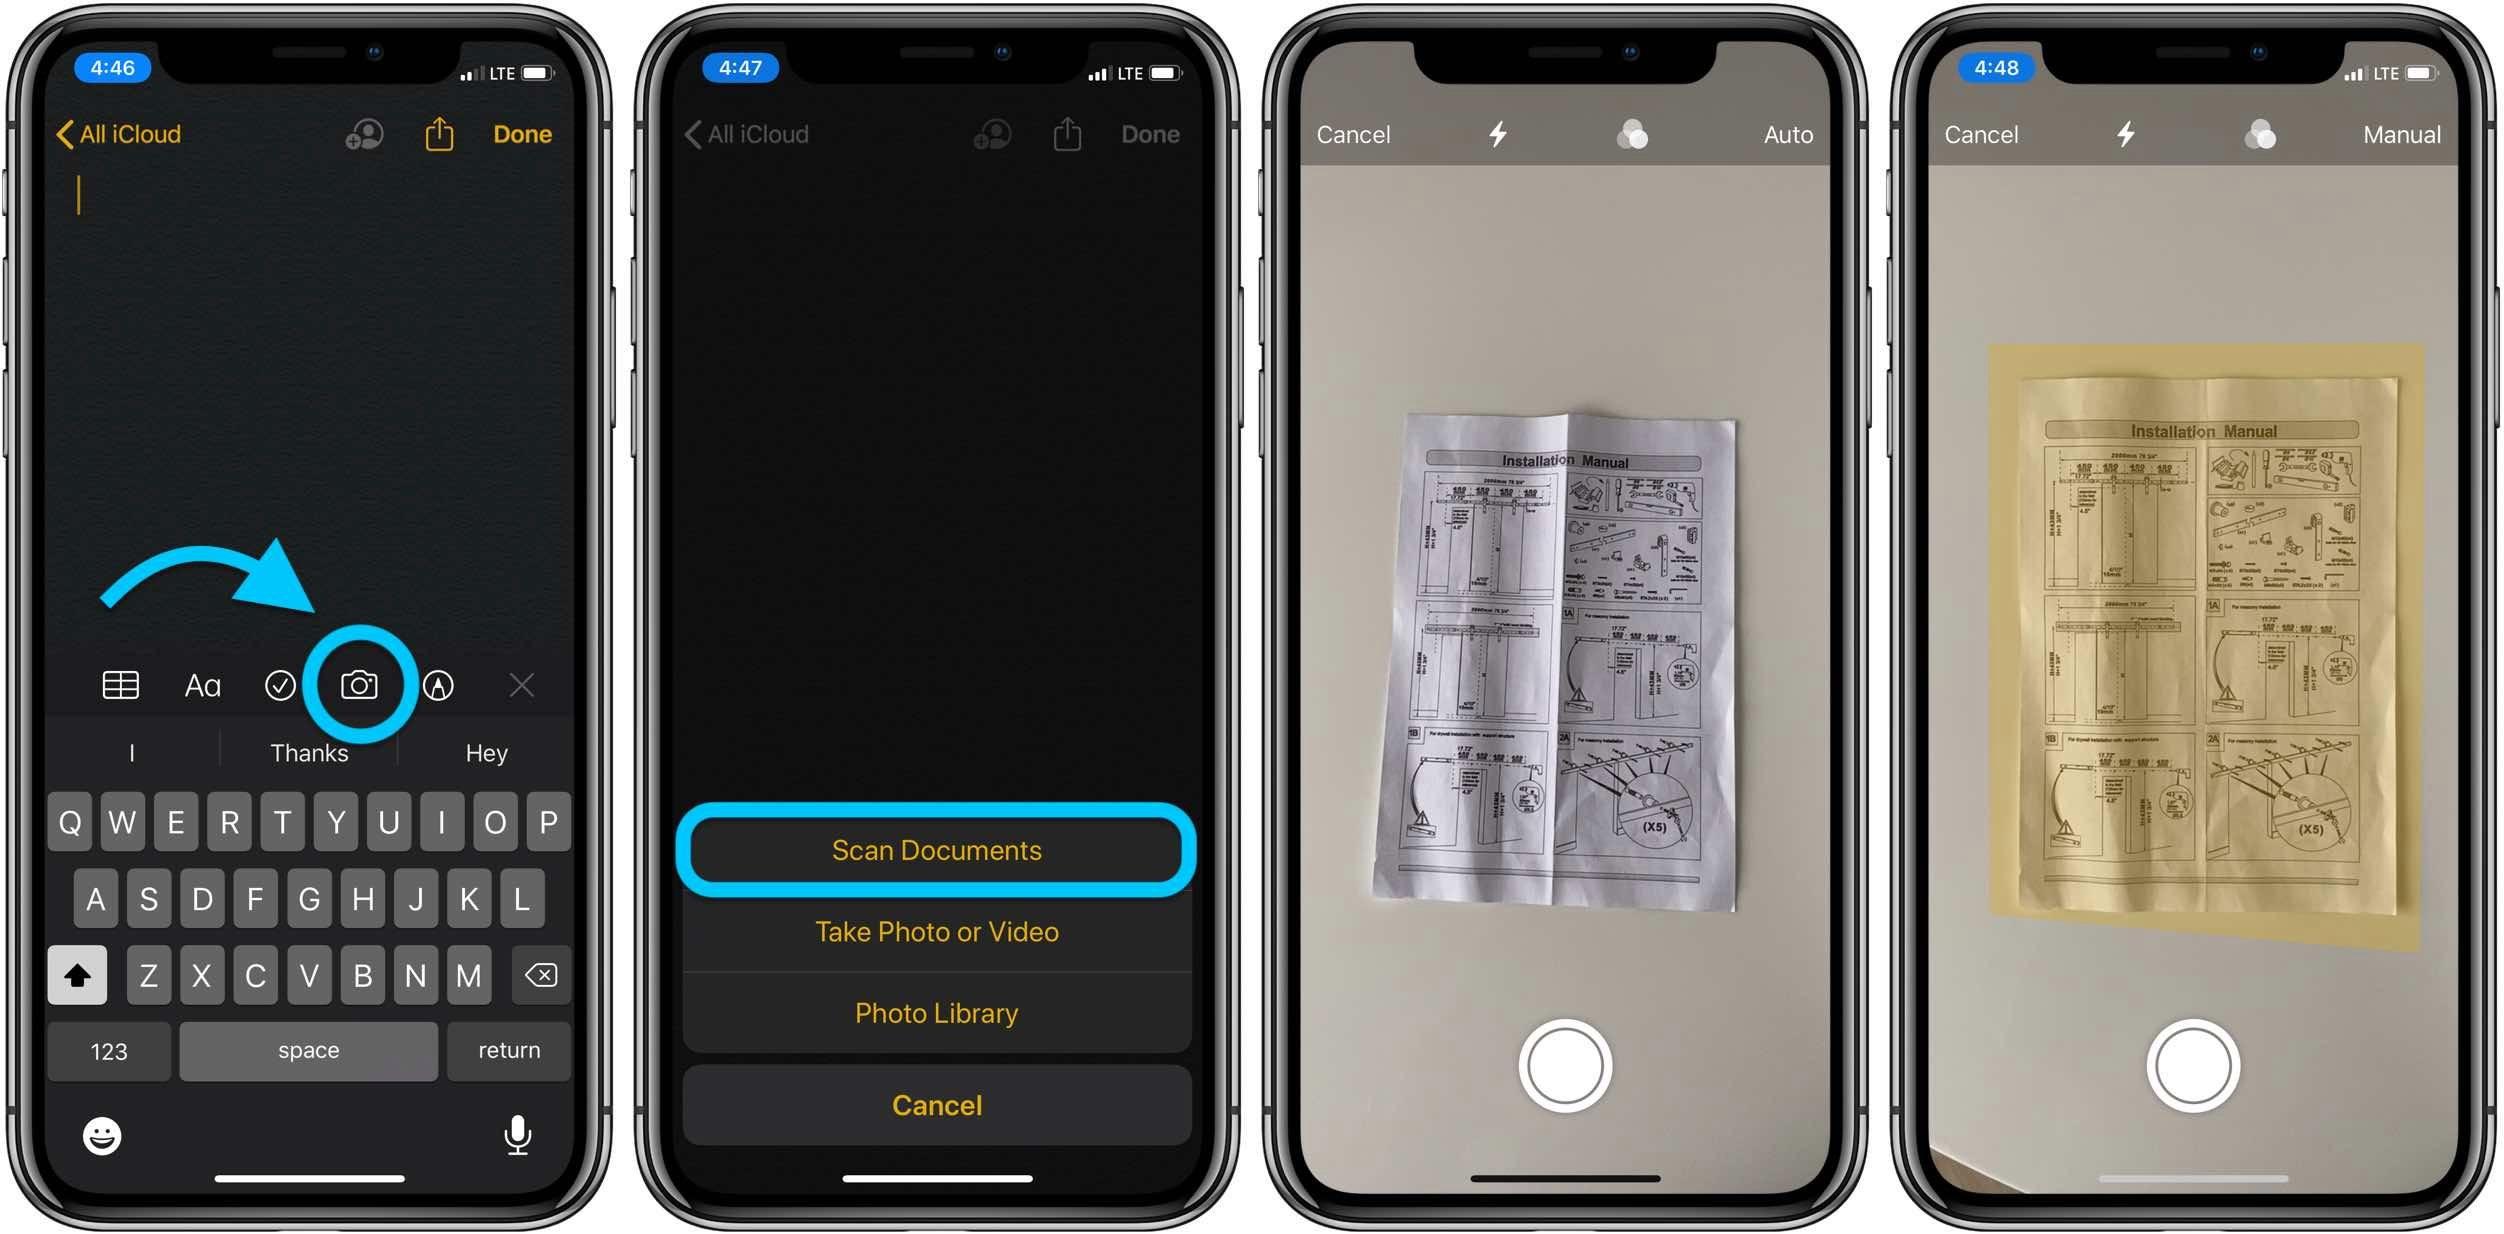 "<span href=""https://9to5mac.com/2020/03/31/ios-11-how-to-scan-documents-notes-app/"">iOS: Cómo escanear documentos con la aplicación de Notas</a>"